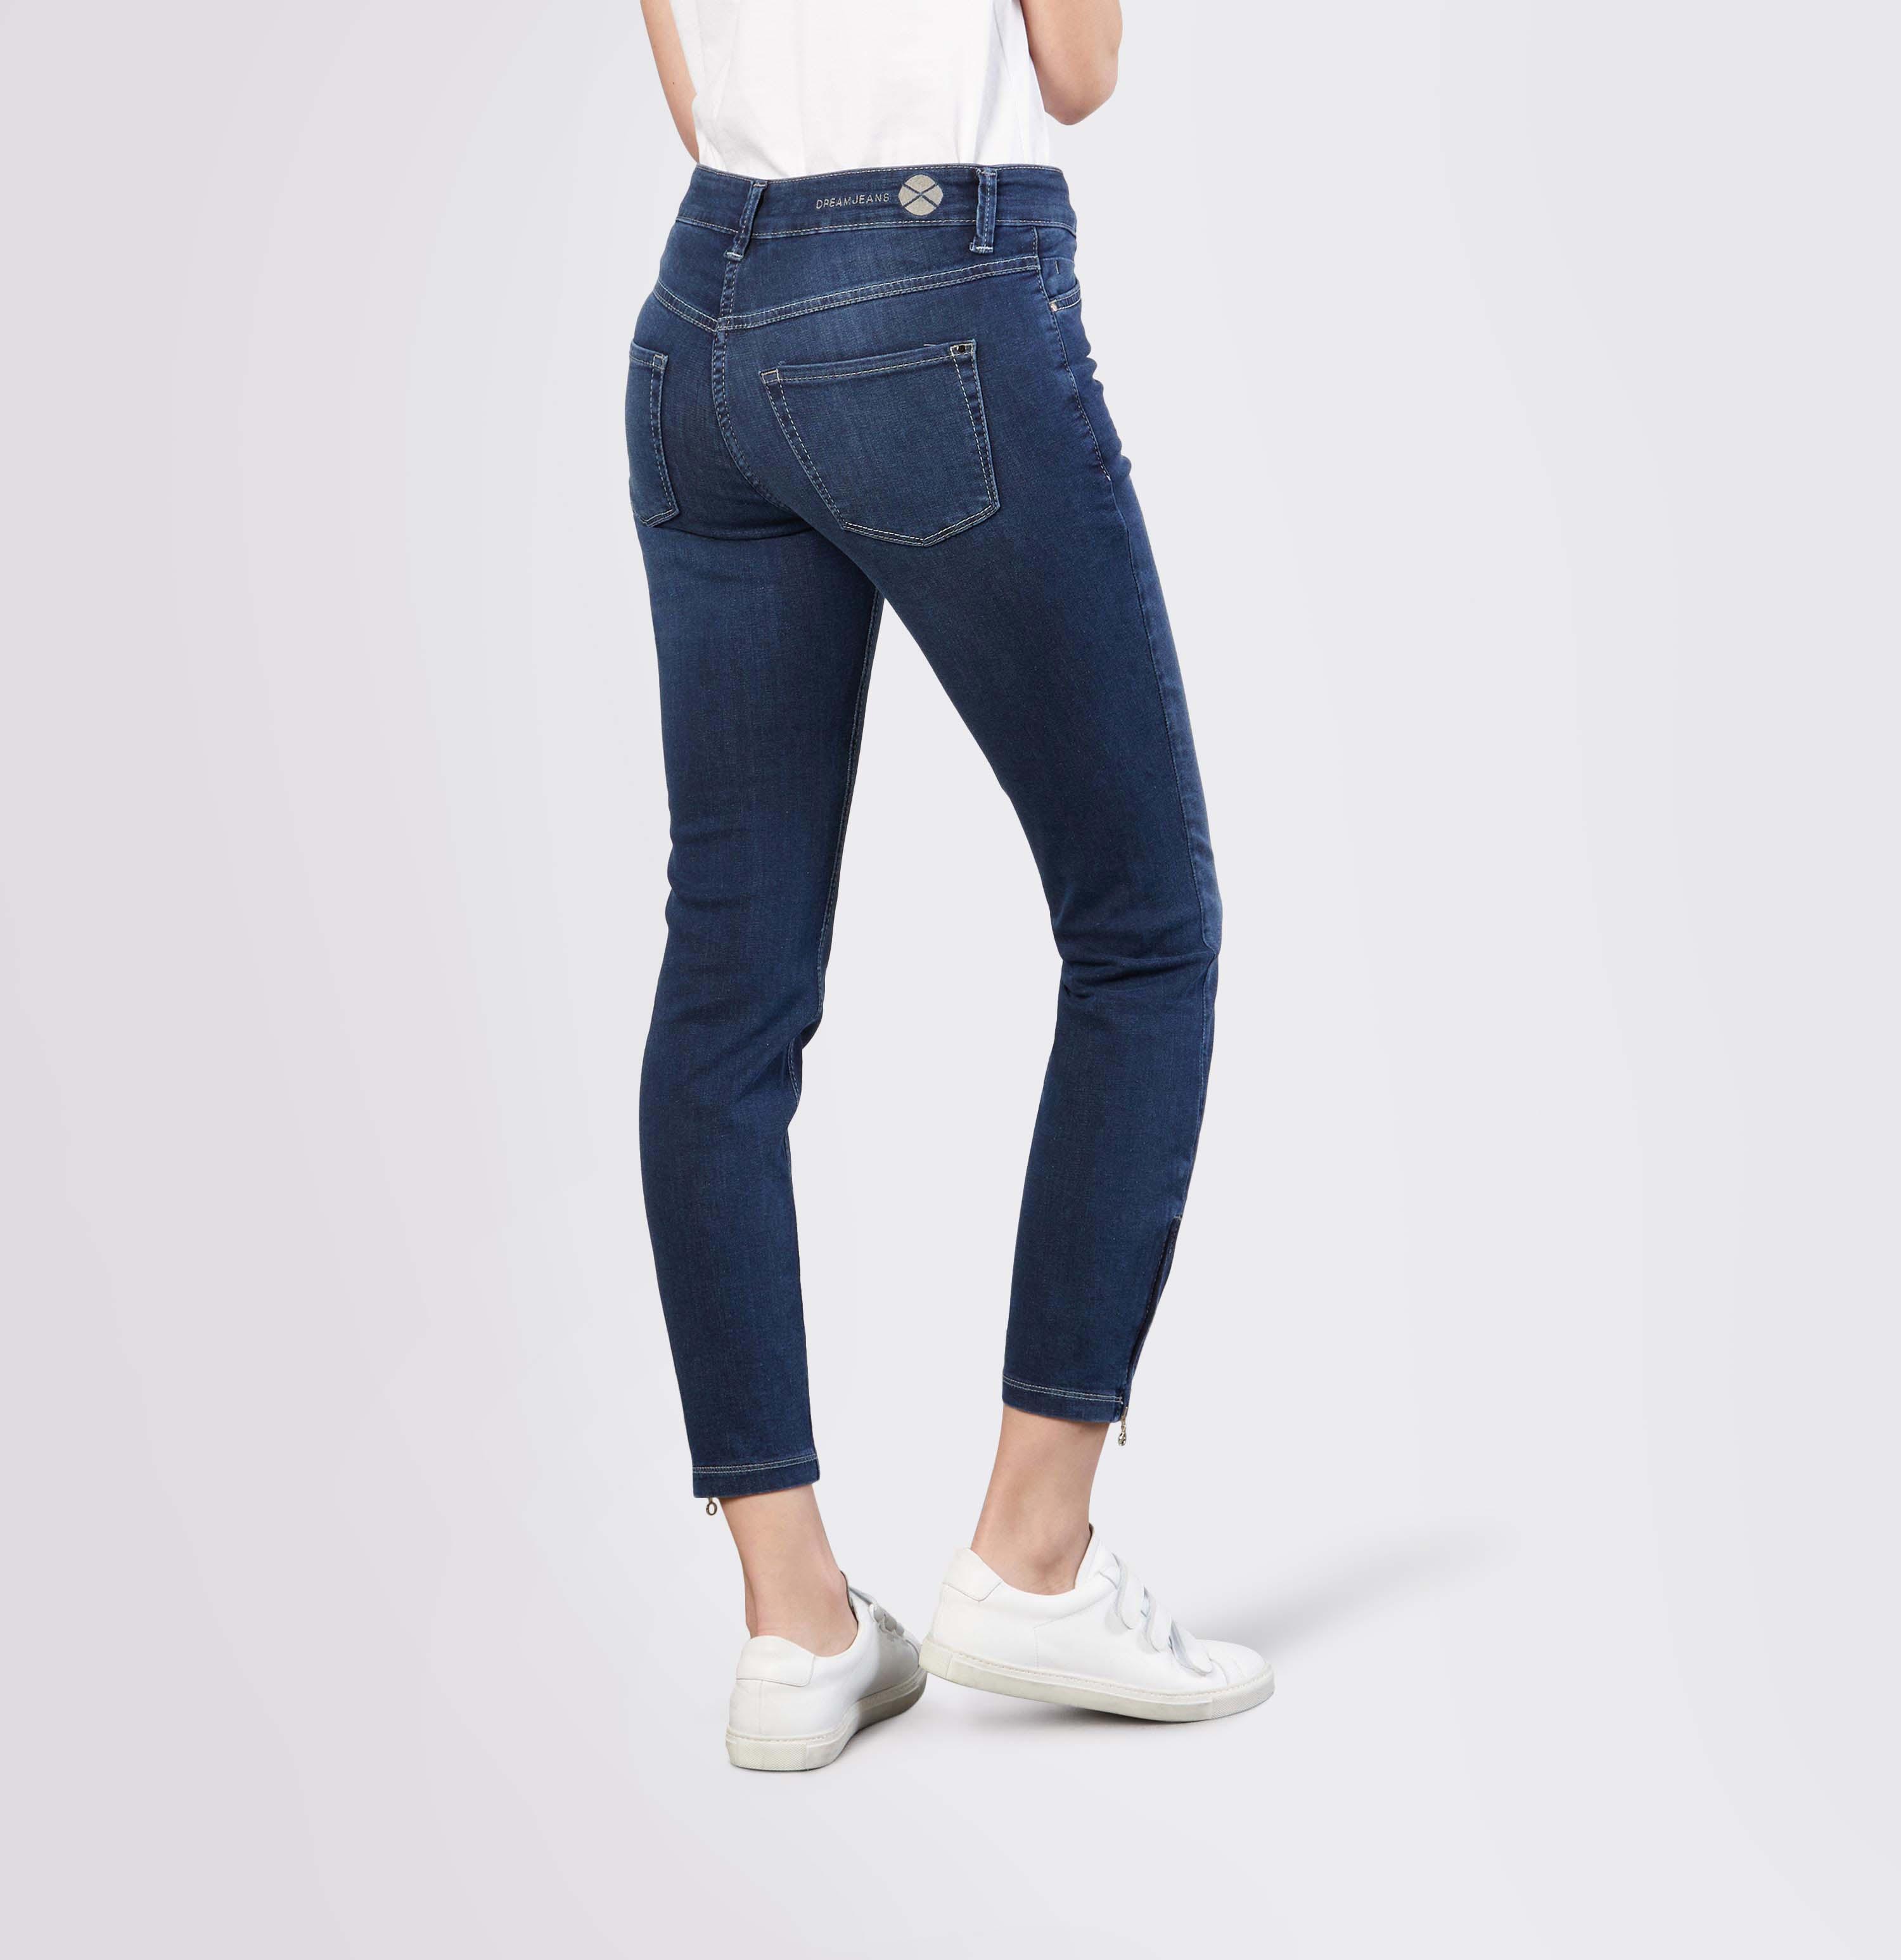 MAC Jeans Dream Chic dark used